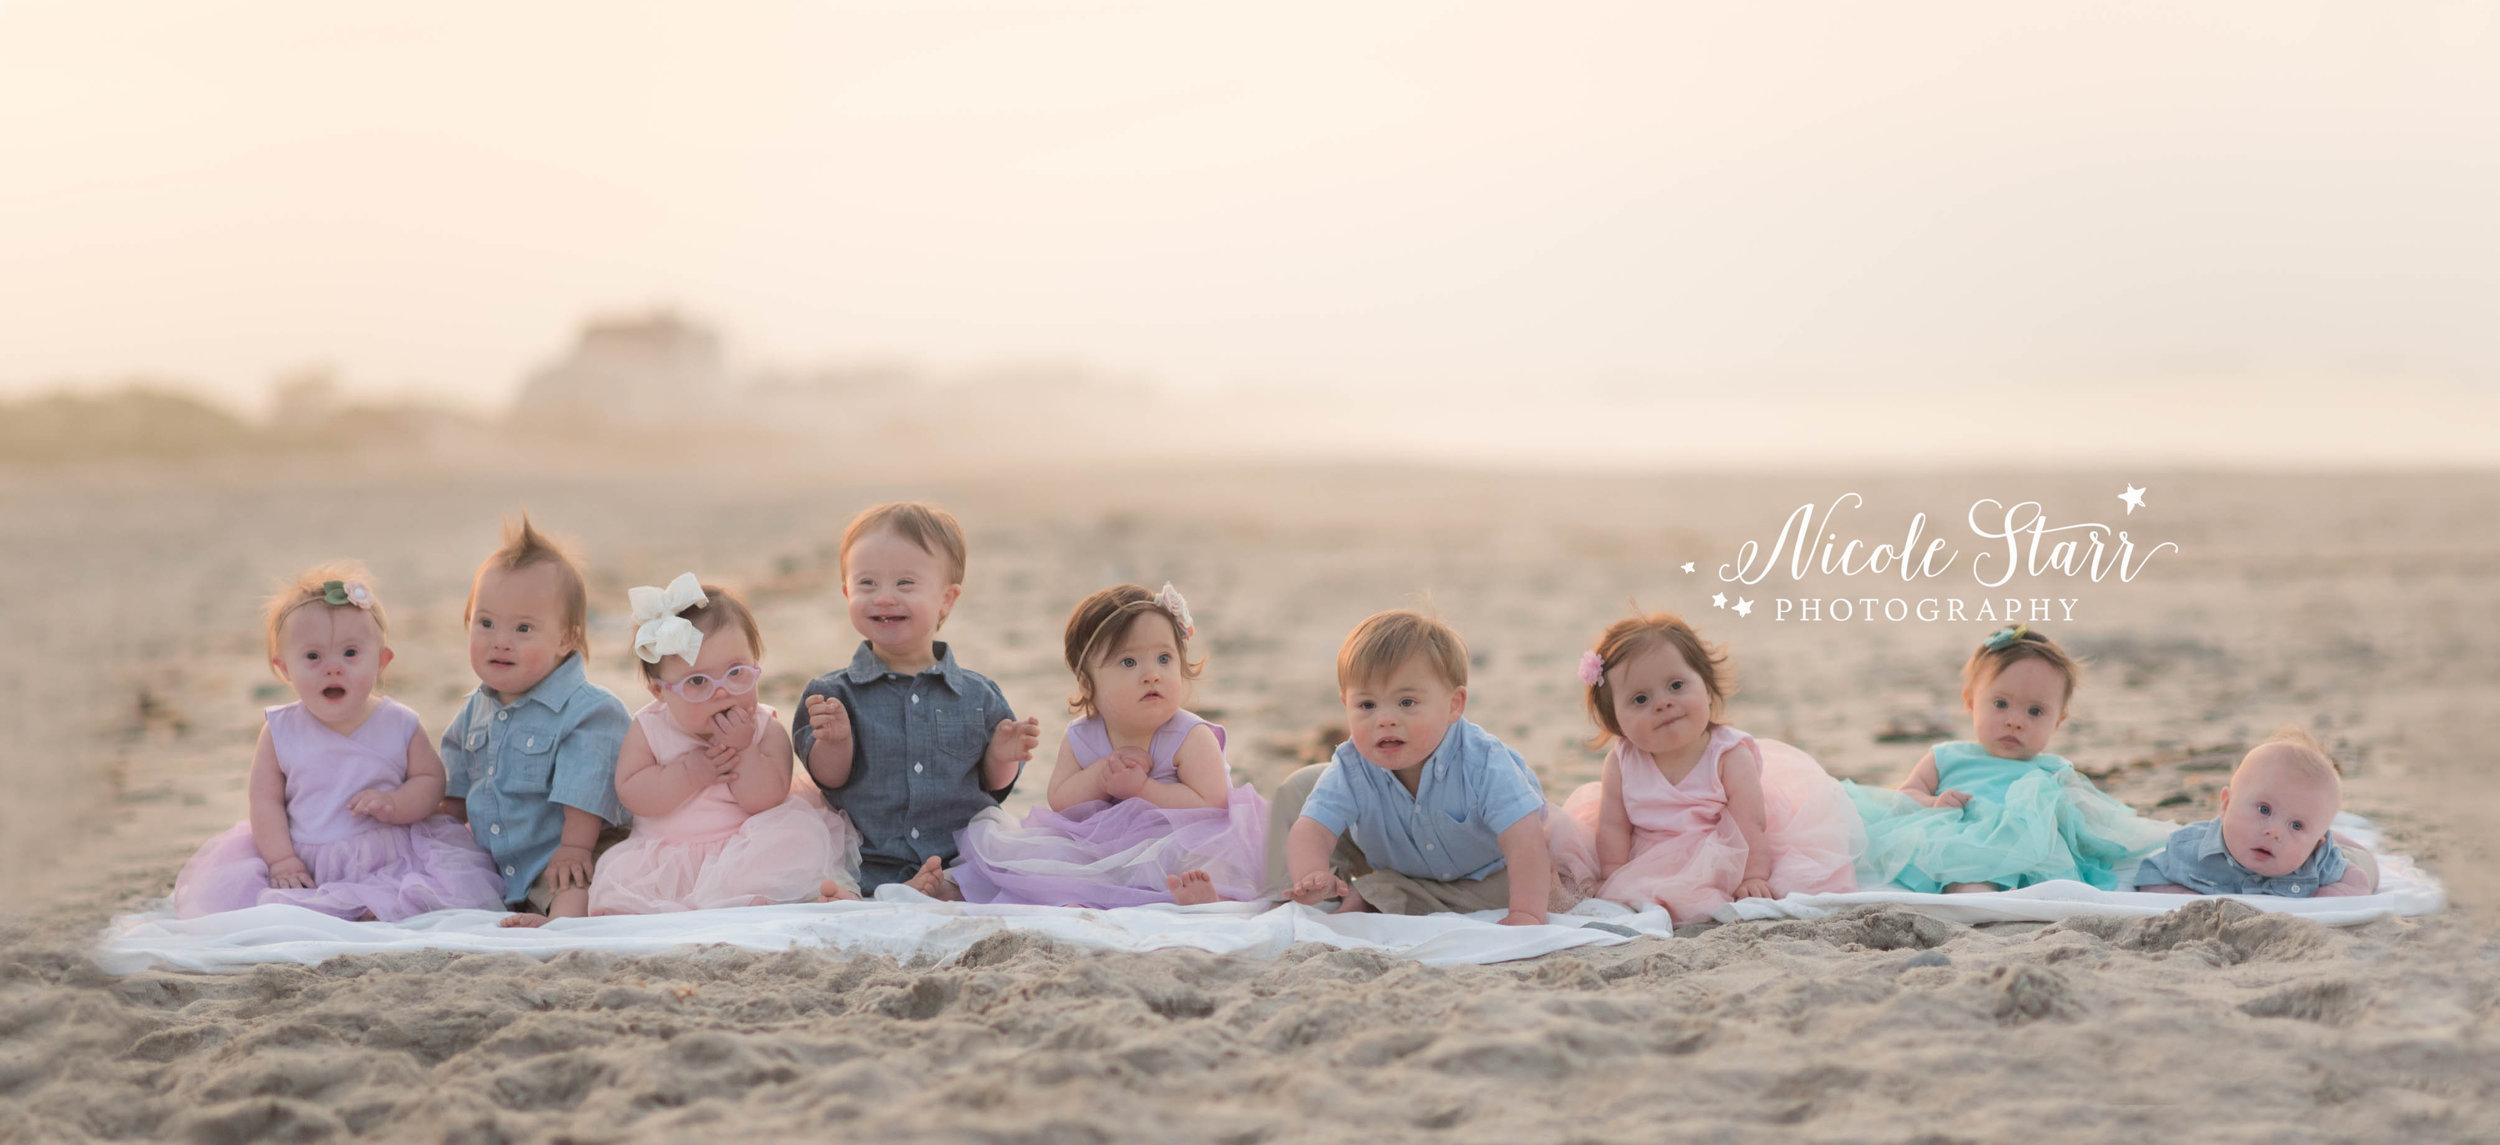 2017 Julias Way Breastfeeding Shoot-5.jpg